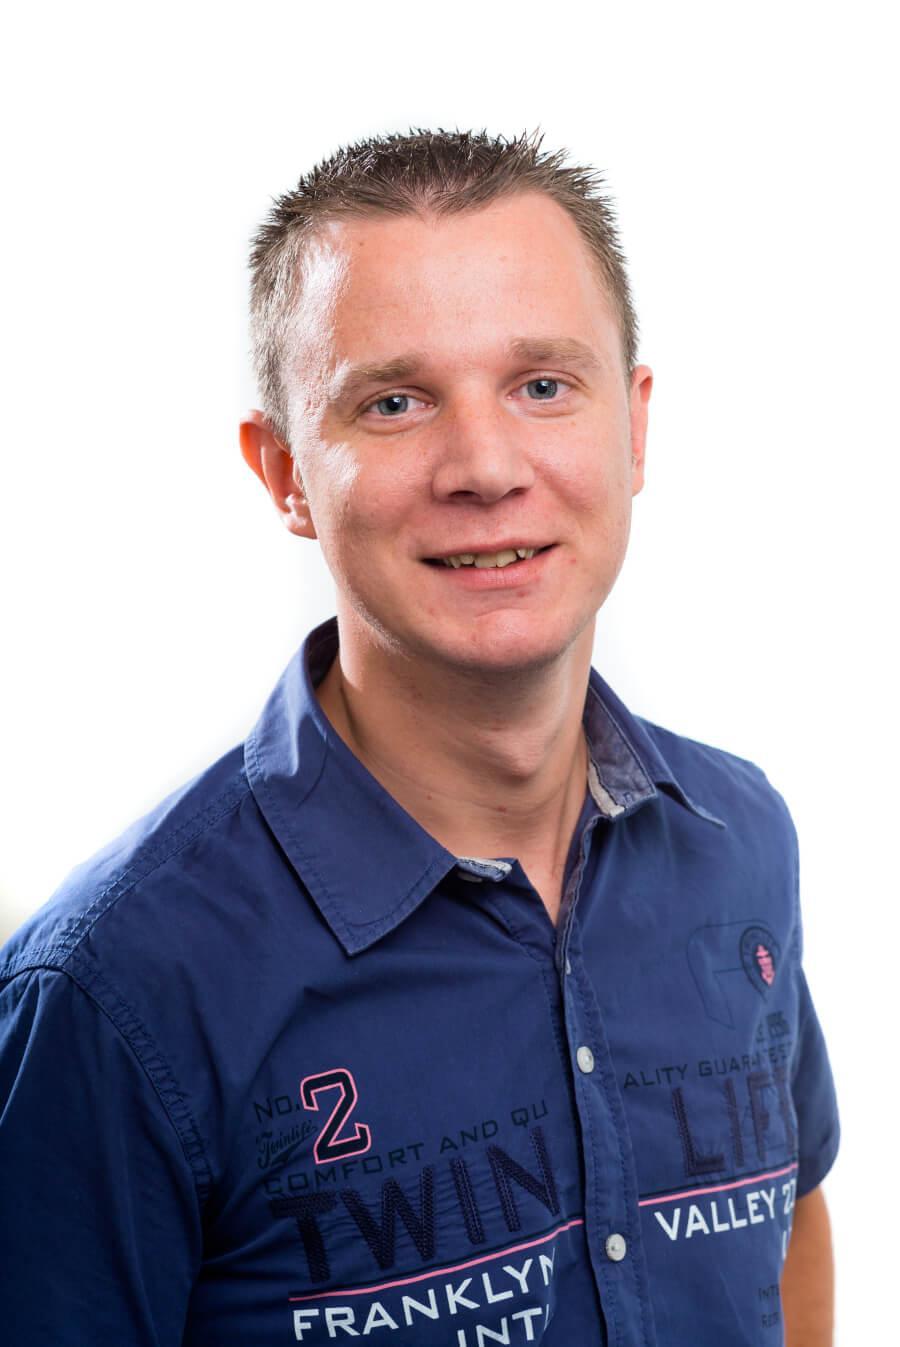 Pasfoto Martin Gijssen